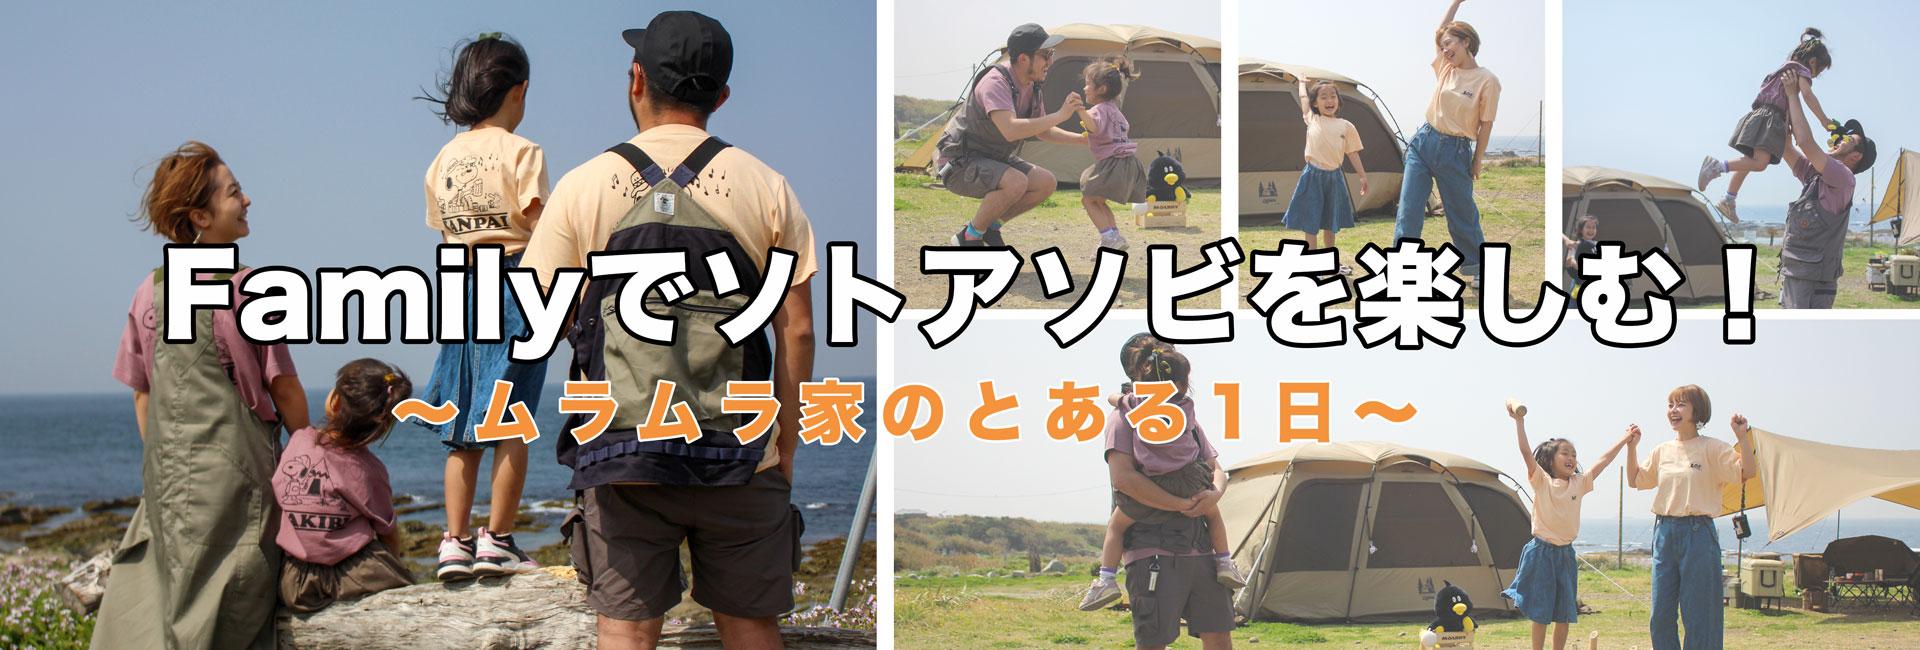 grn outdoor×ROOT CO.コラボレーション第一弾!